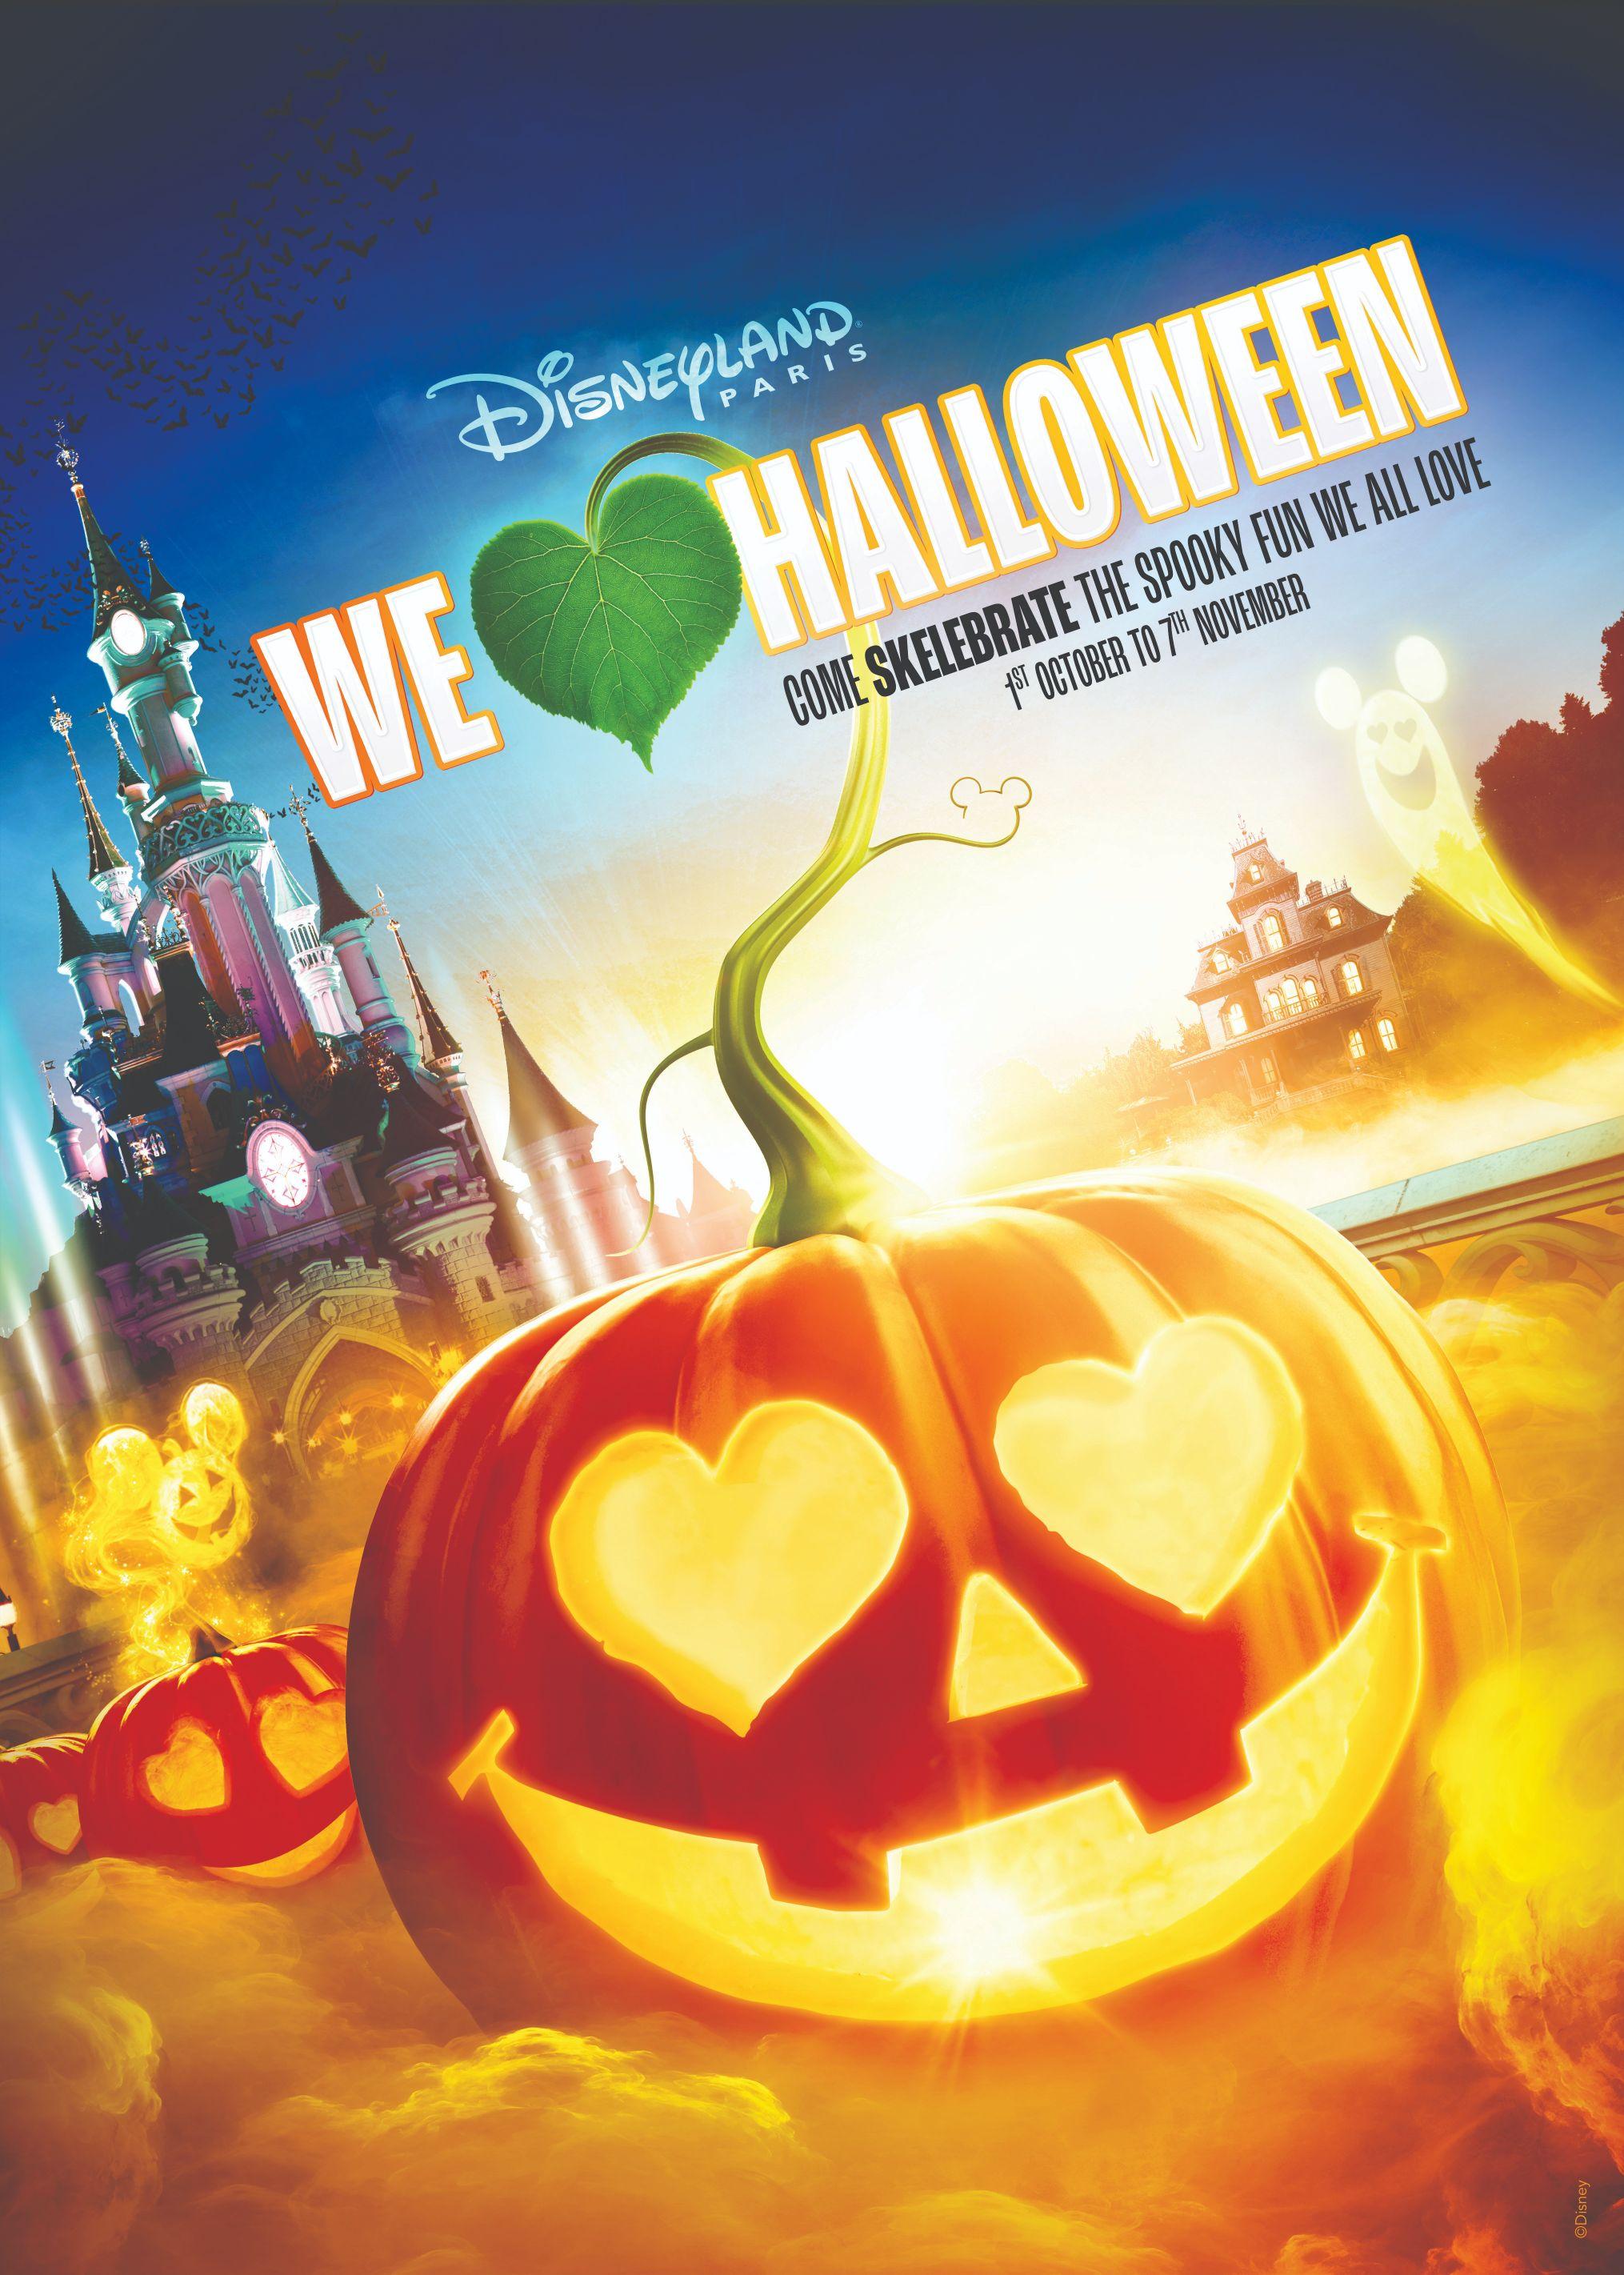 2021 - Festival Halloweem Disney Hallow18